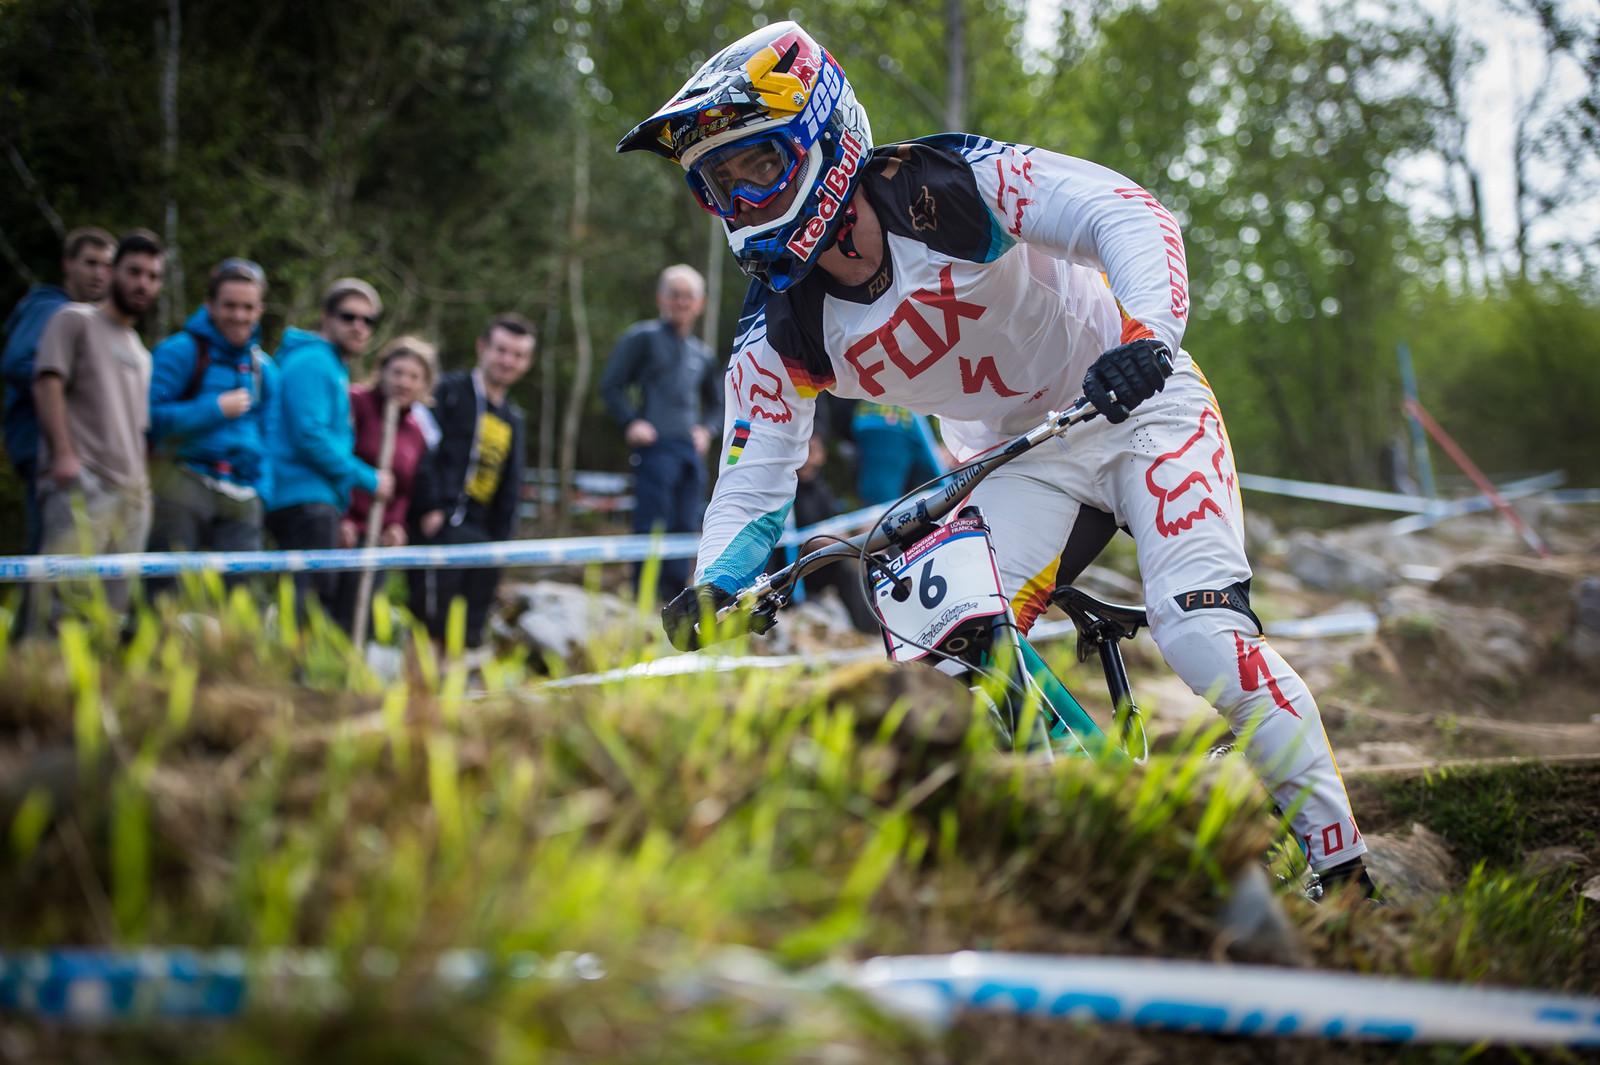 Loic Bruni, Lourdes Race Morning Practice - iceman2058 - Mountain Biking Pictures - Vital MTB